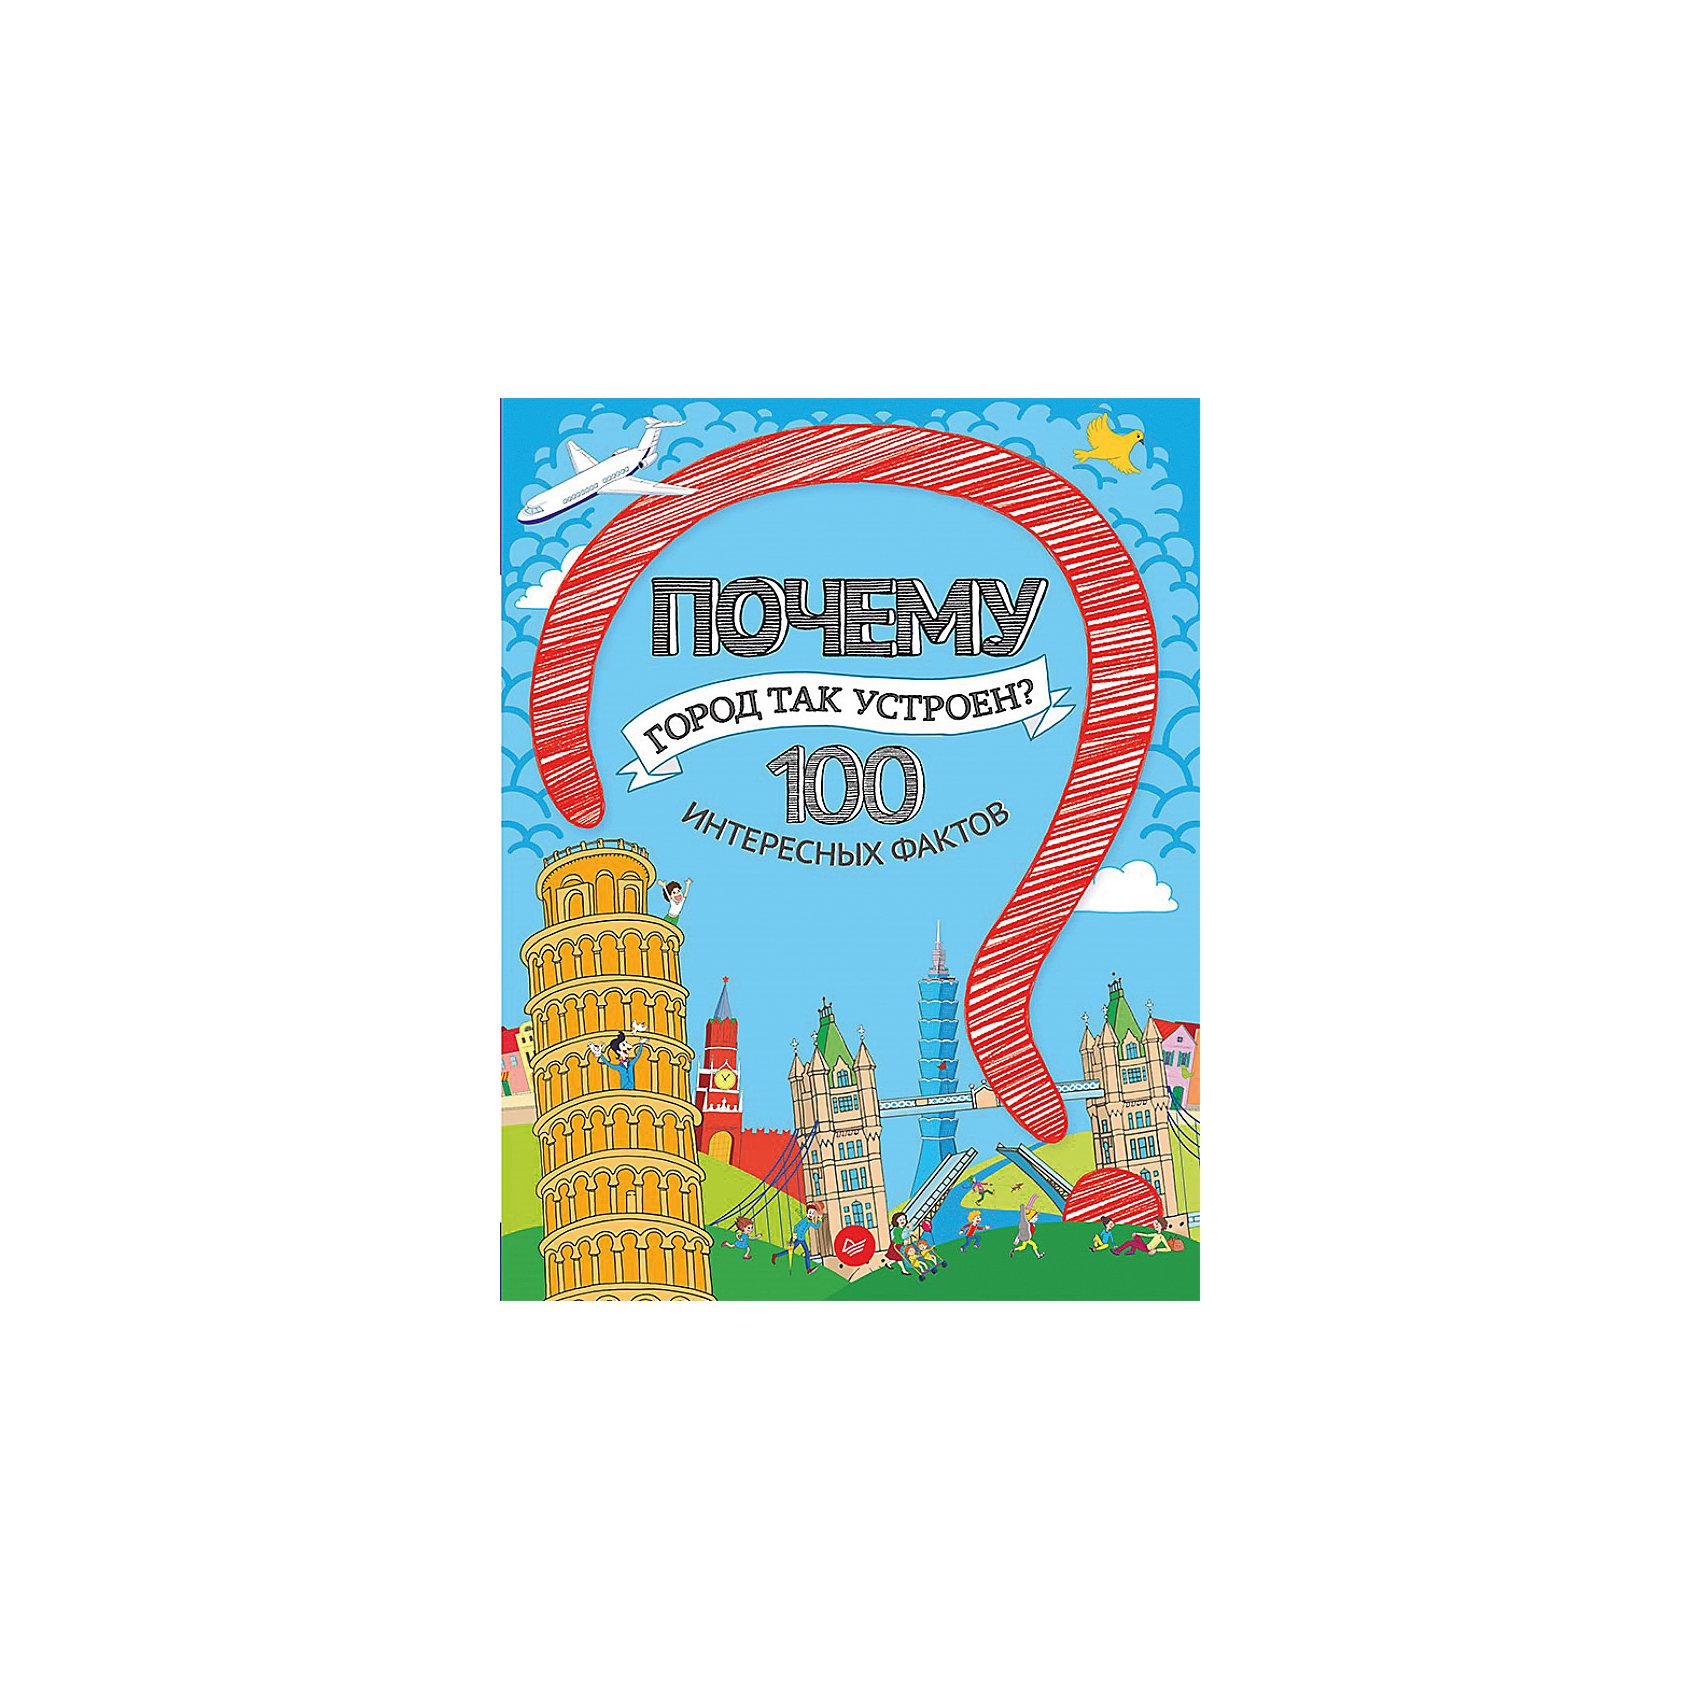 ������ ����� ��� �������? 100 ���������� ������ (�����)